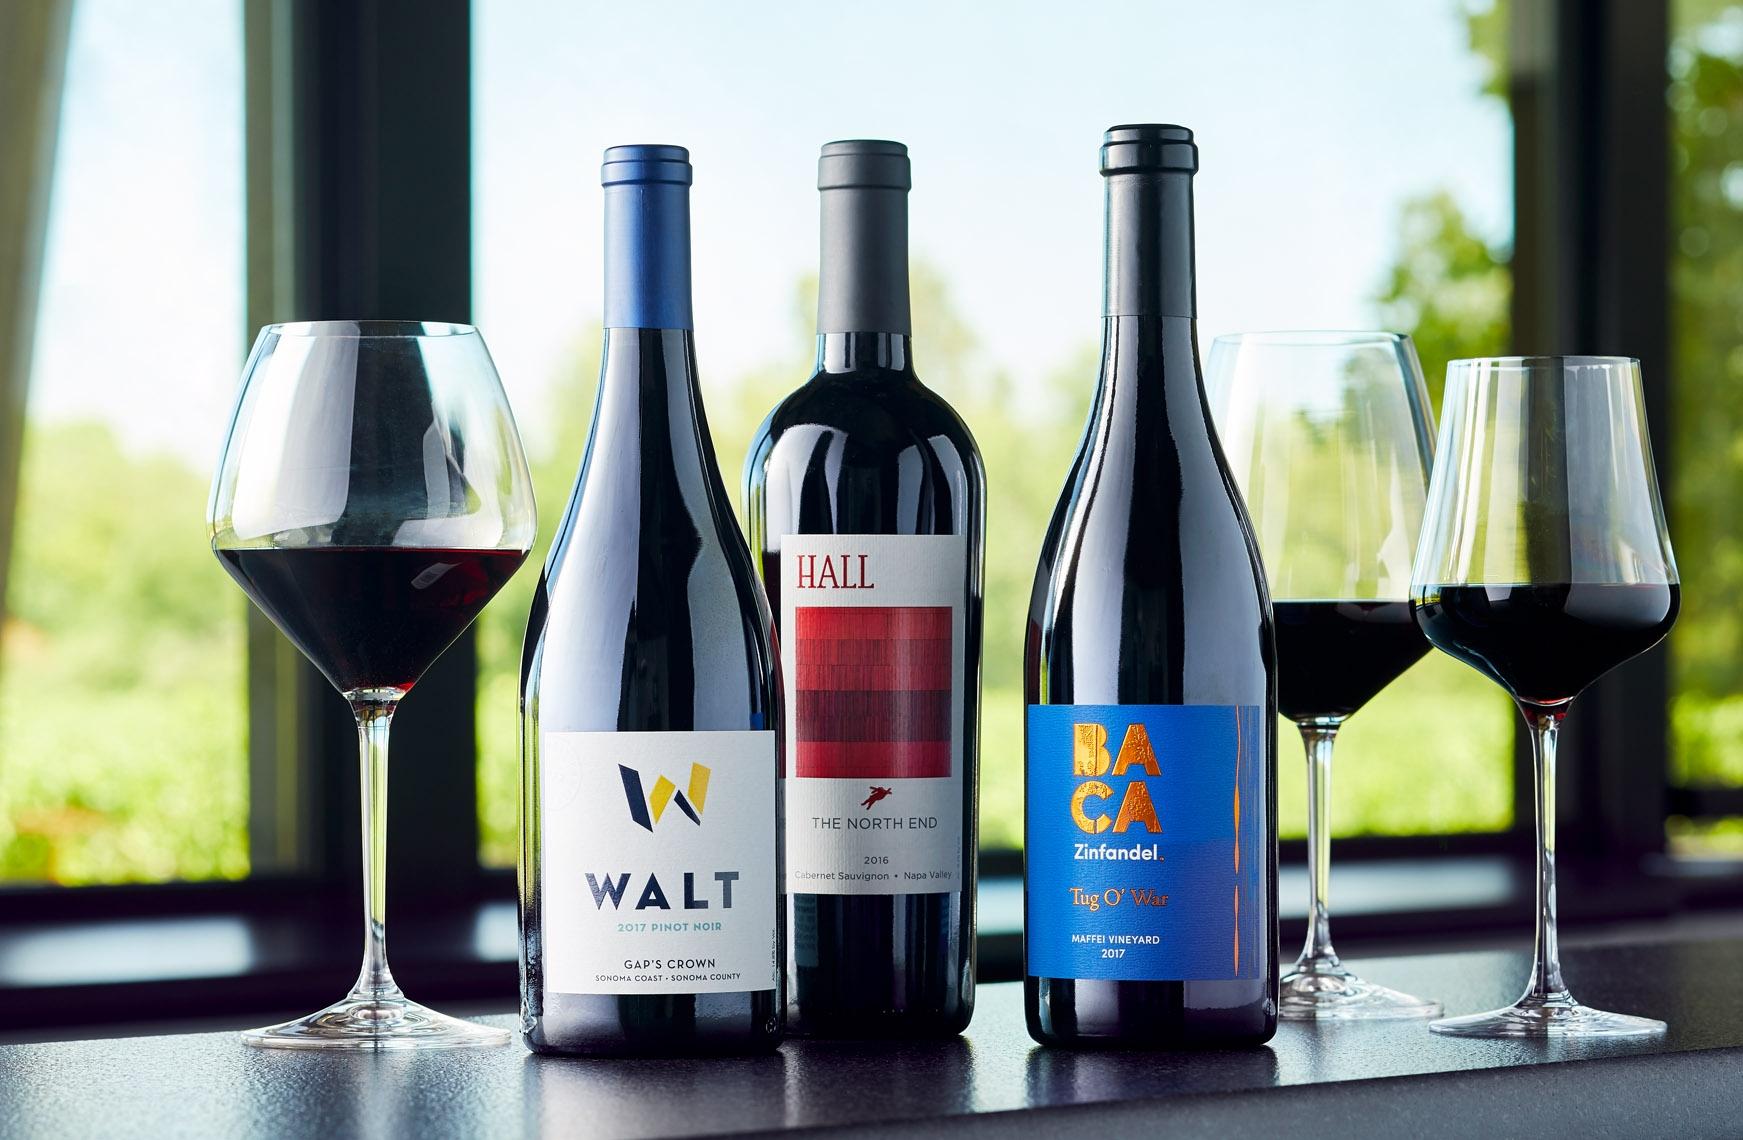 HALL cabernet sauvignon, WALT pinot noir and BACA zinfandel bottles on bar in Healdsburg tasting room